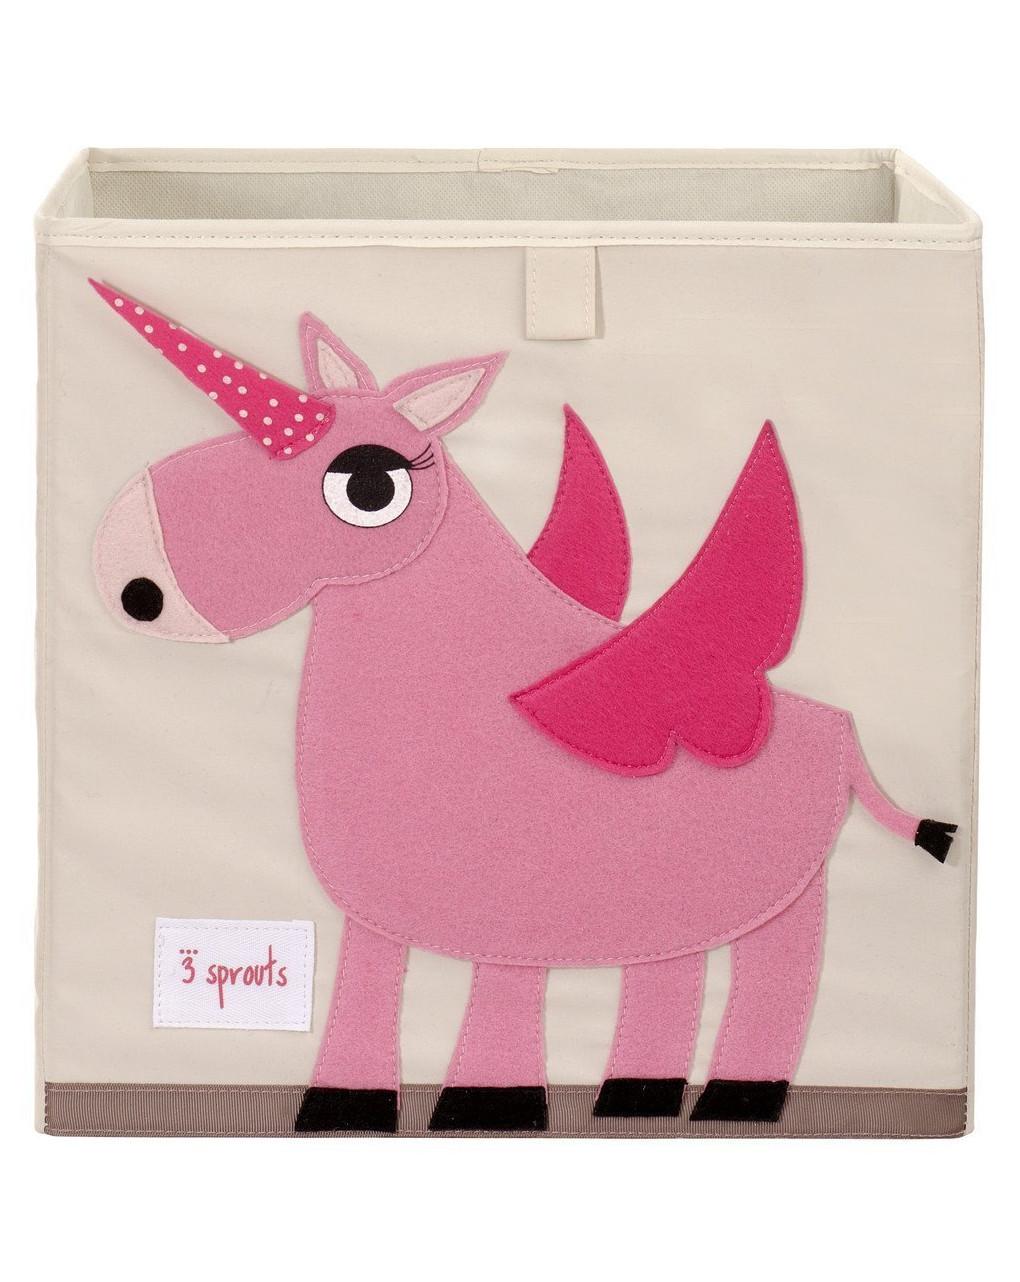 3 Sprouts Κουτί Αποθήκευσης Παιχνιδιών Unicorn